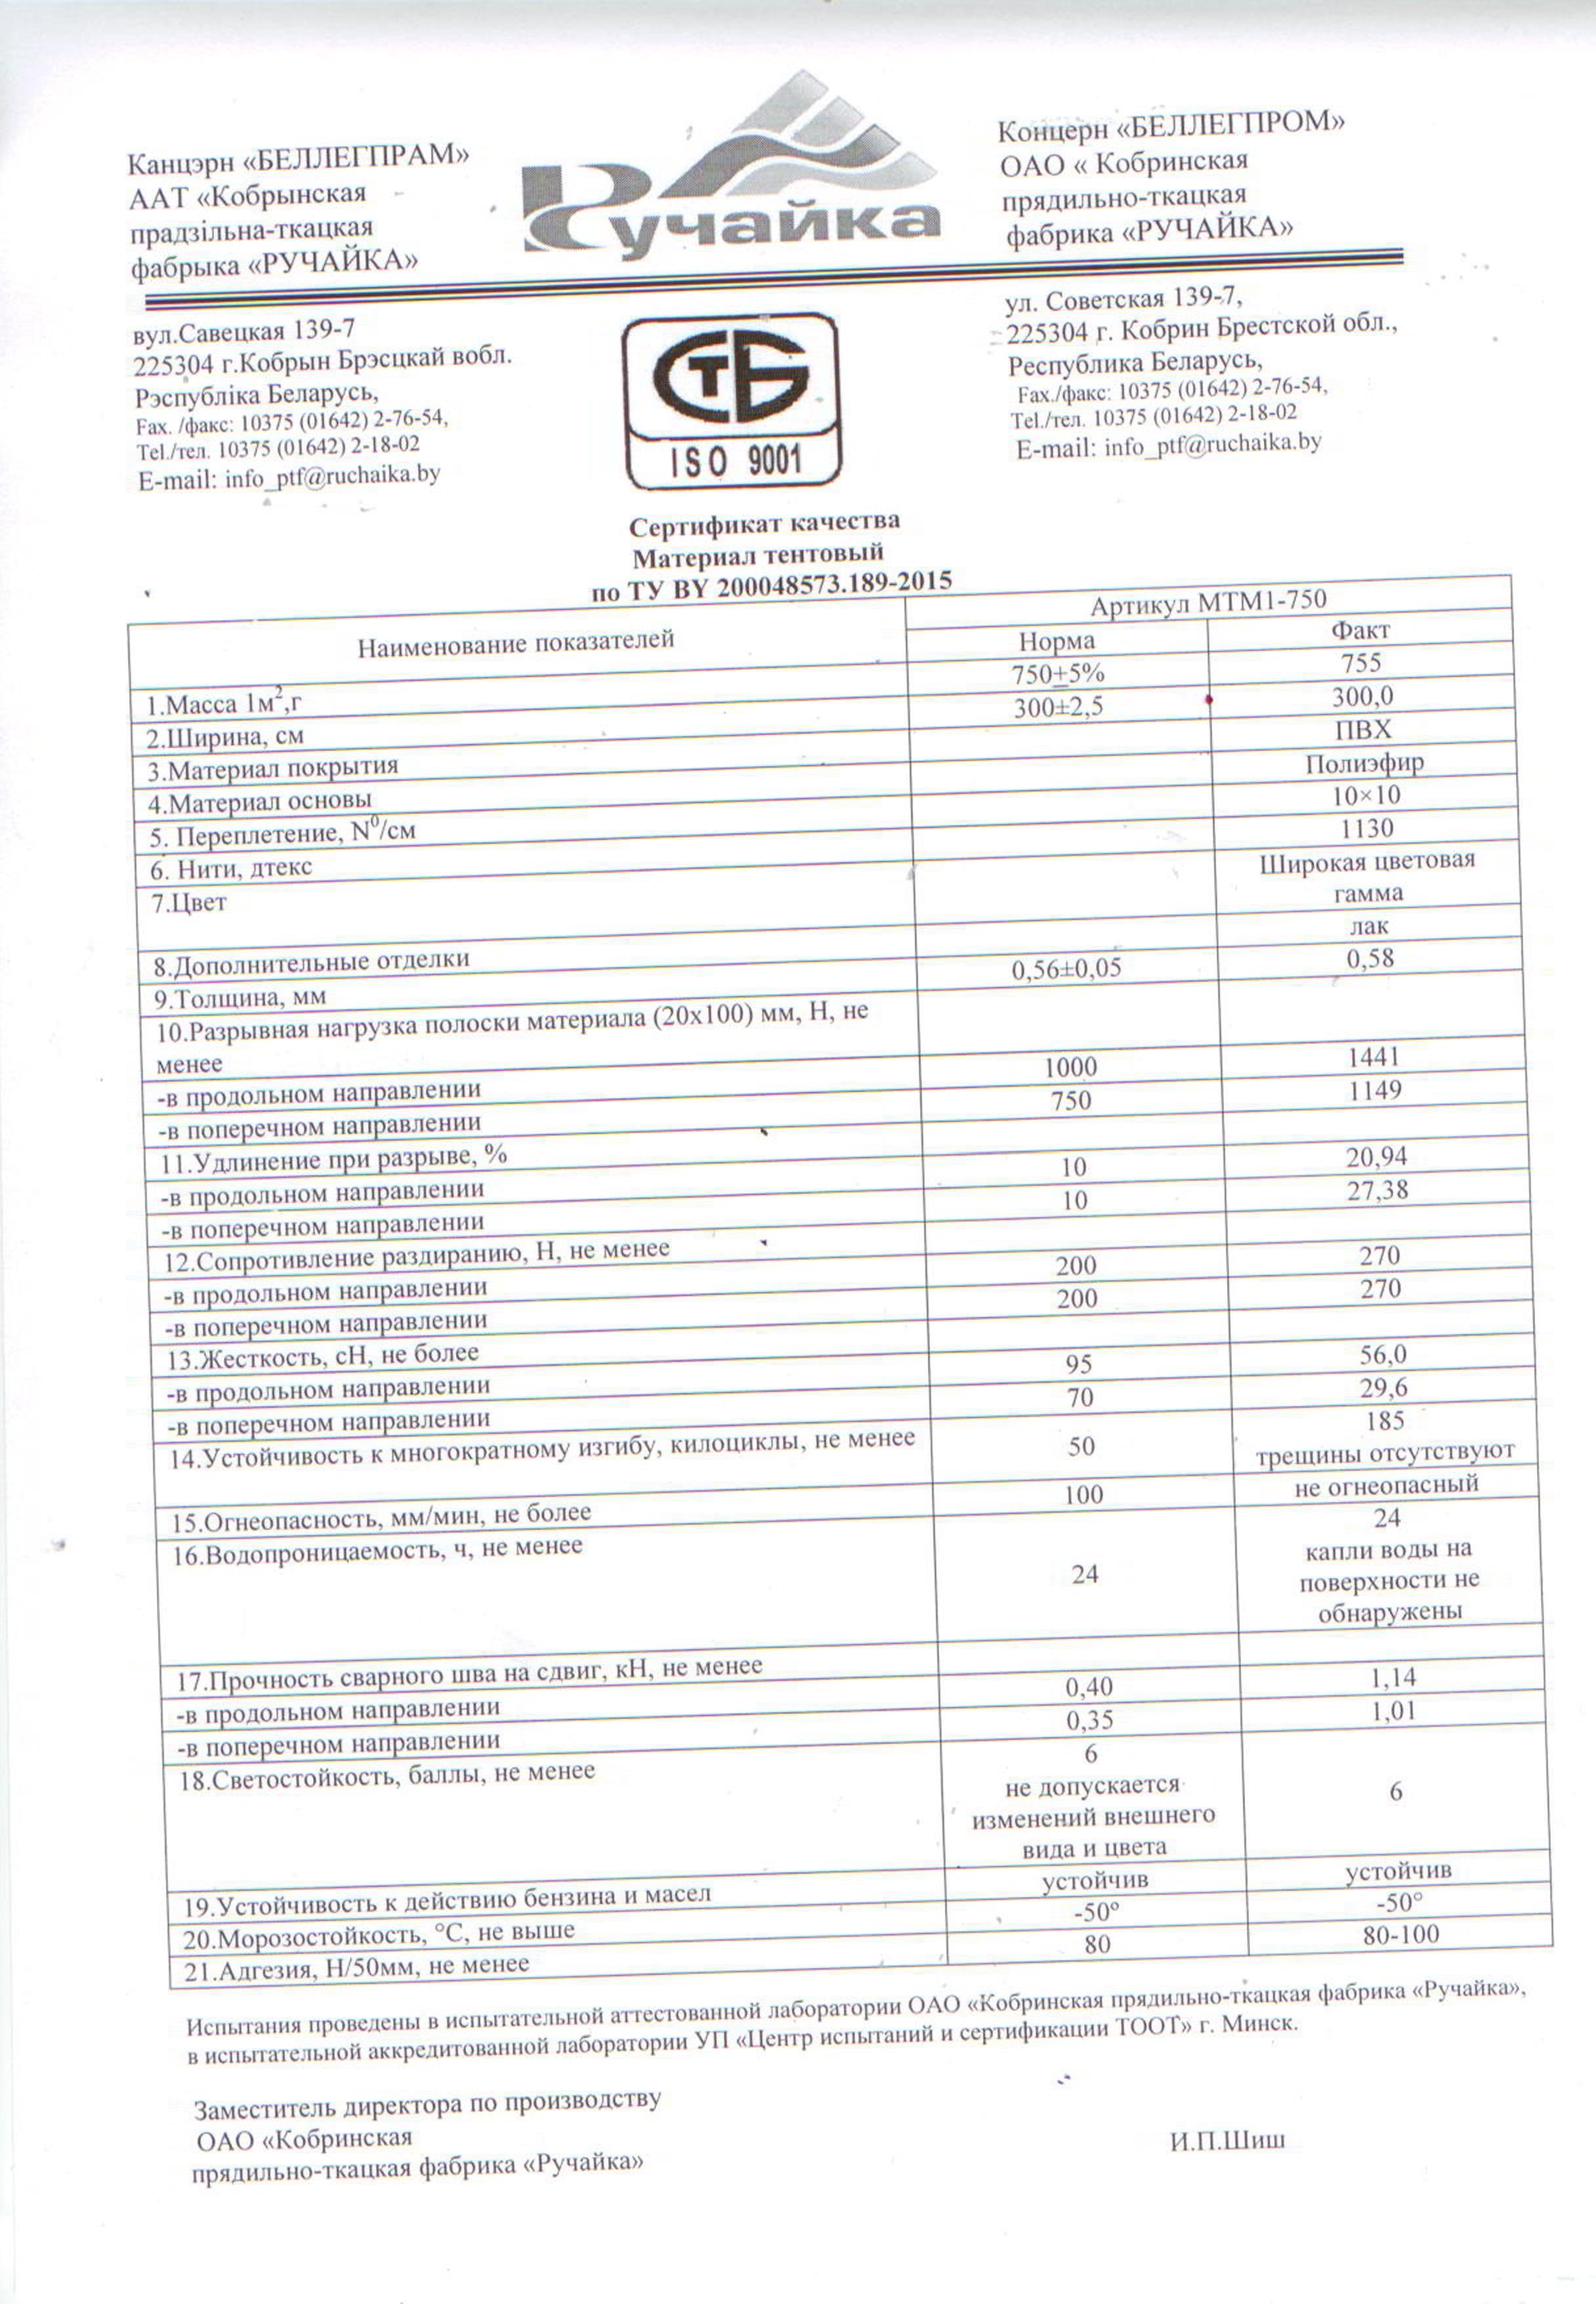 Сертификат МТМ1-750